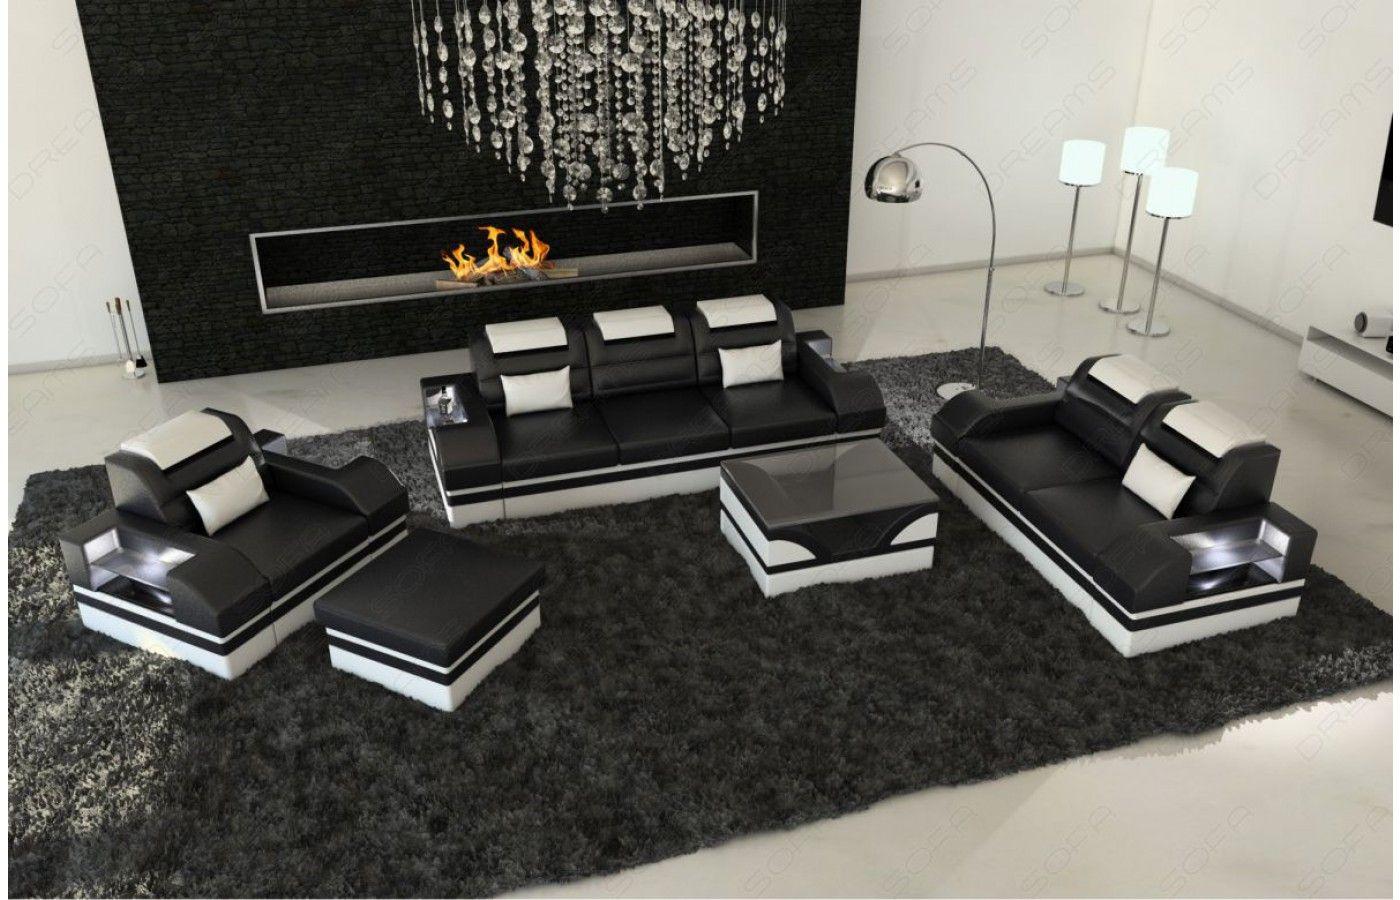 Inspirational  Design Leder Couchgarnitur PARMA mit LED Beleuchtung Exklusiv bei Sofa